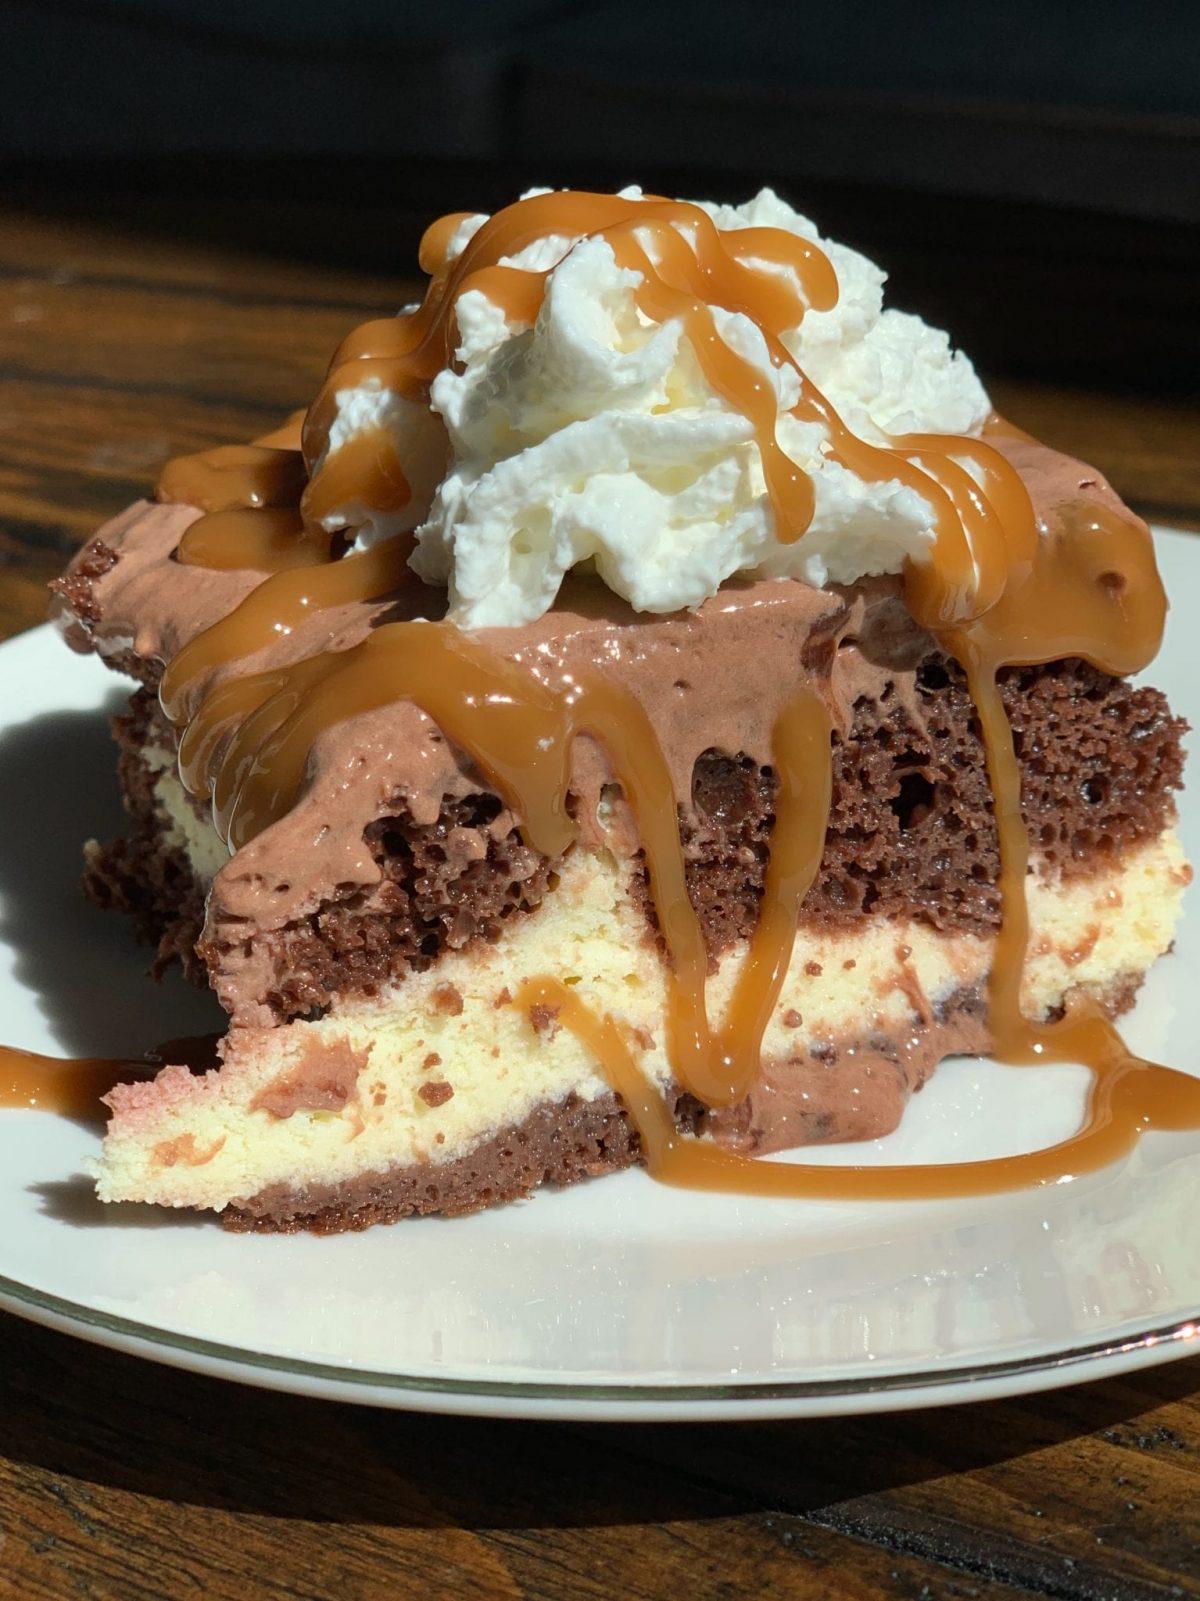 Lightened Up Cream Cheese Chocolate Cake Pound Dropper